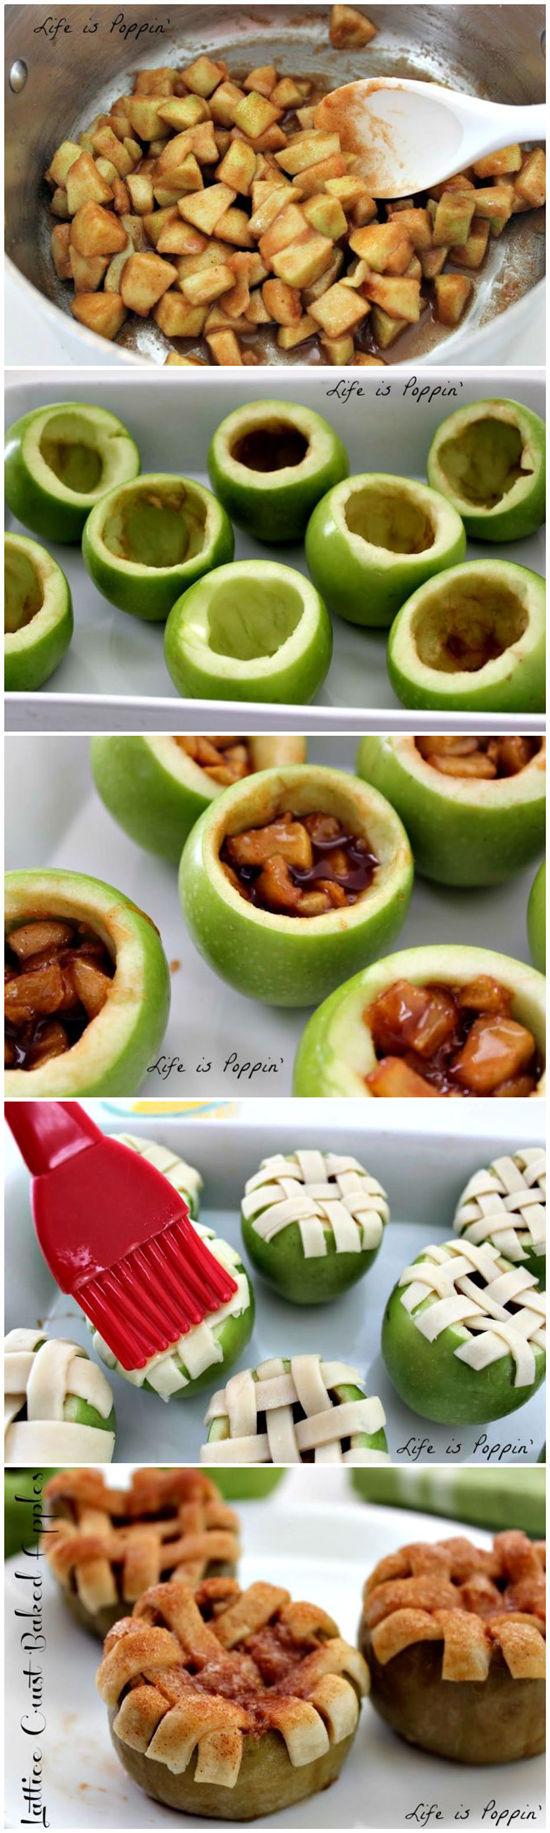 Lattice Crust Baked Apples